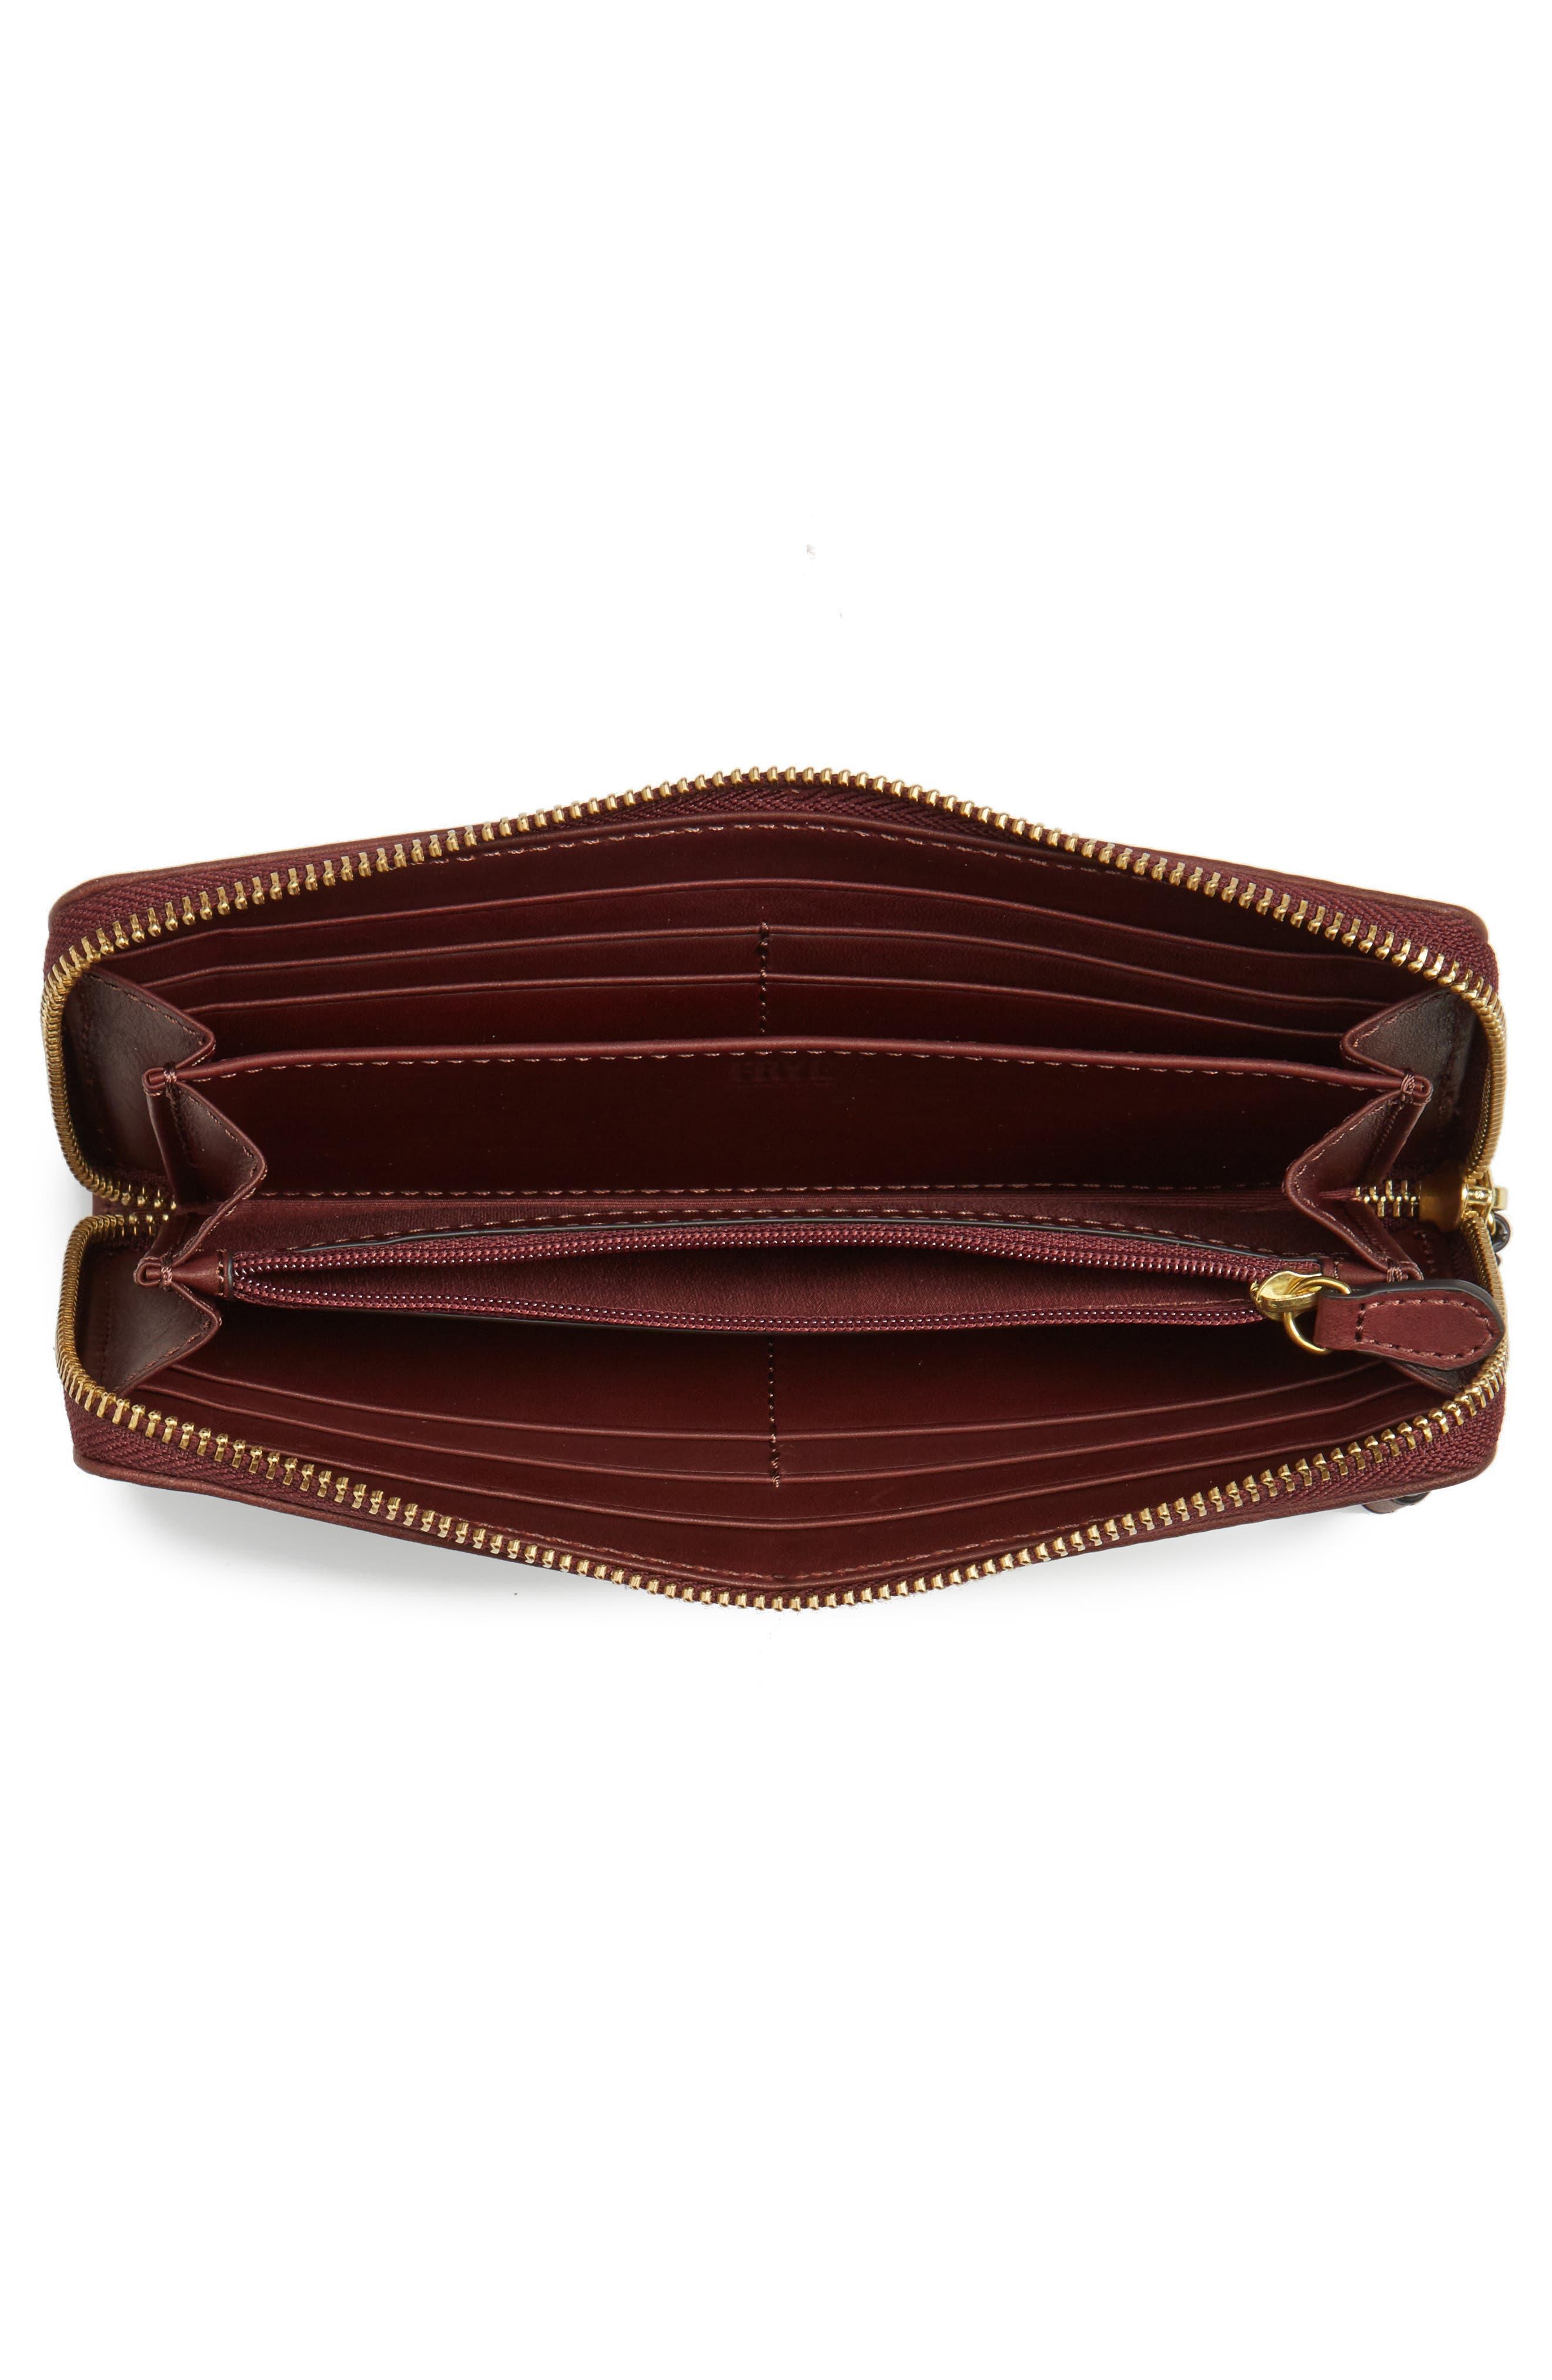 Alternate Image 2  - Frye Campus Rivet Leather Continental Zip Wallet